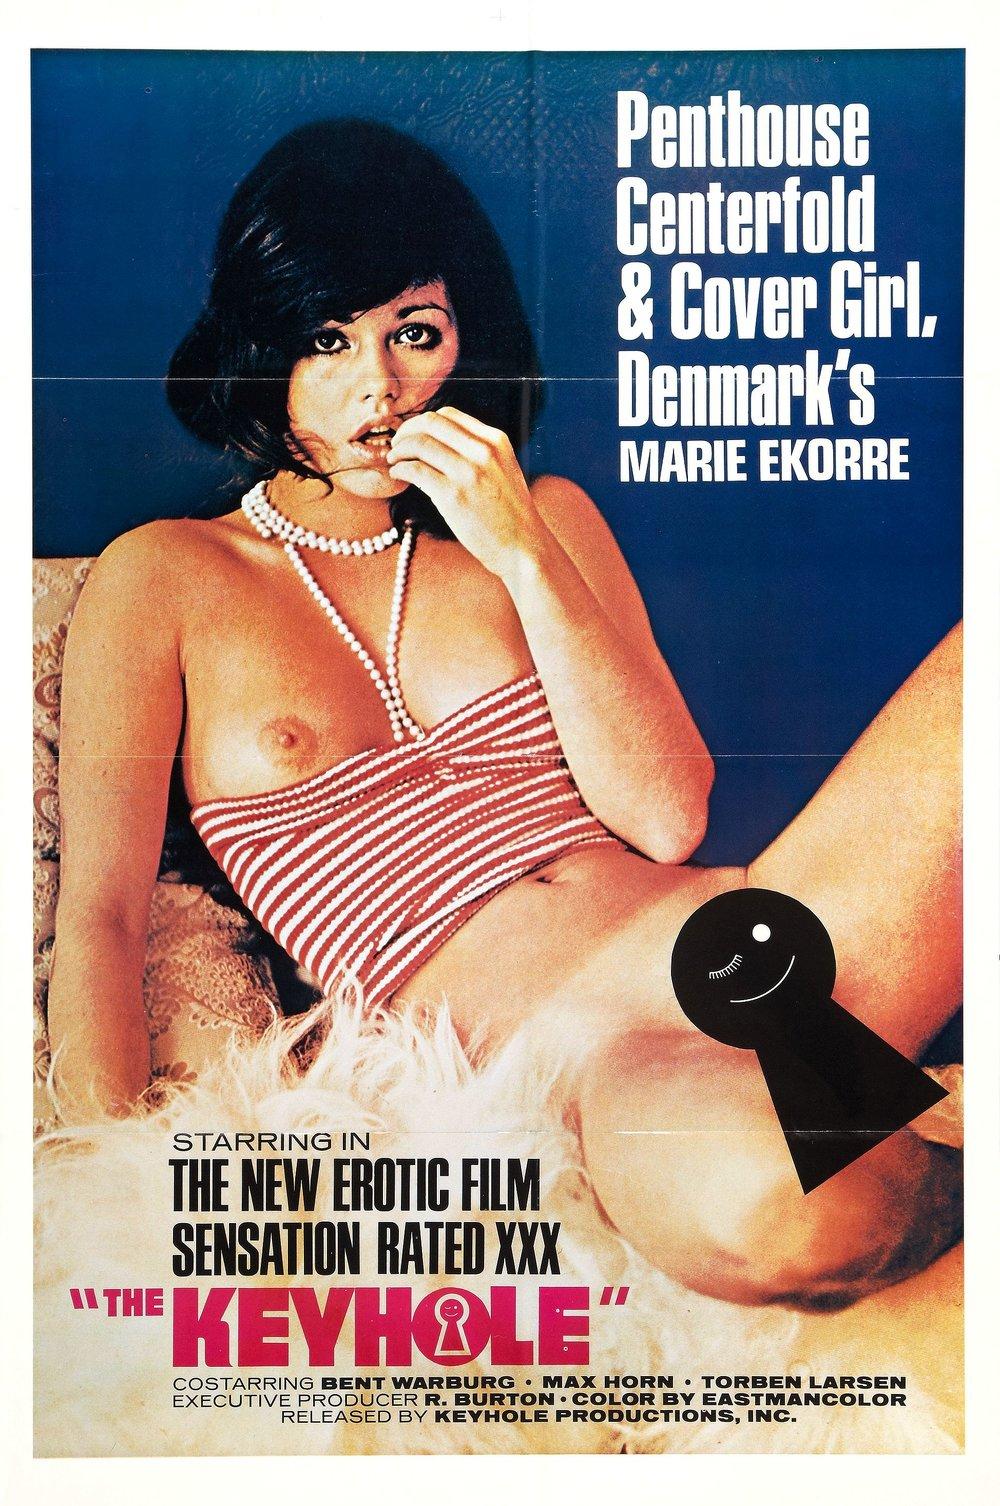 keyhole_1974_poster_02.jpg